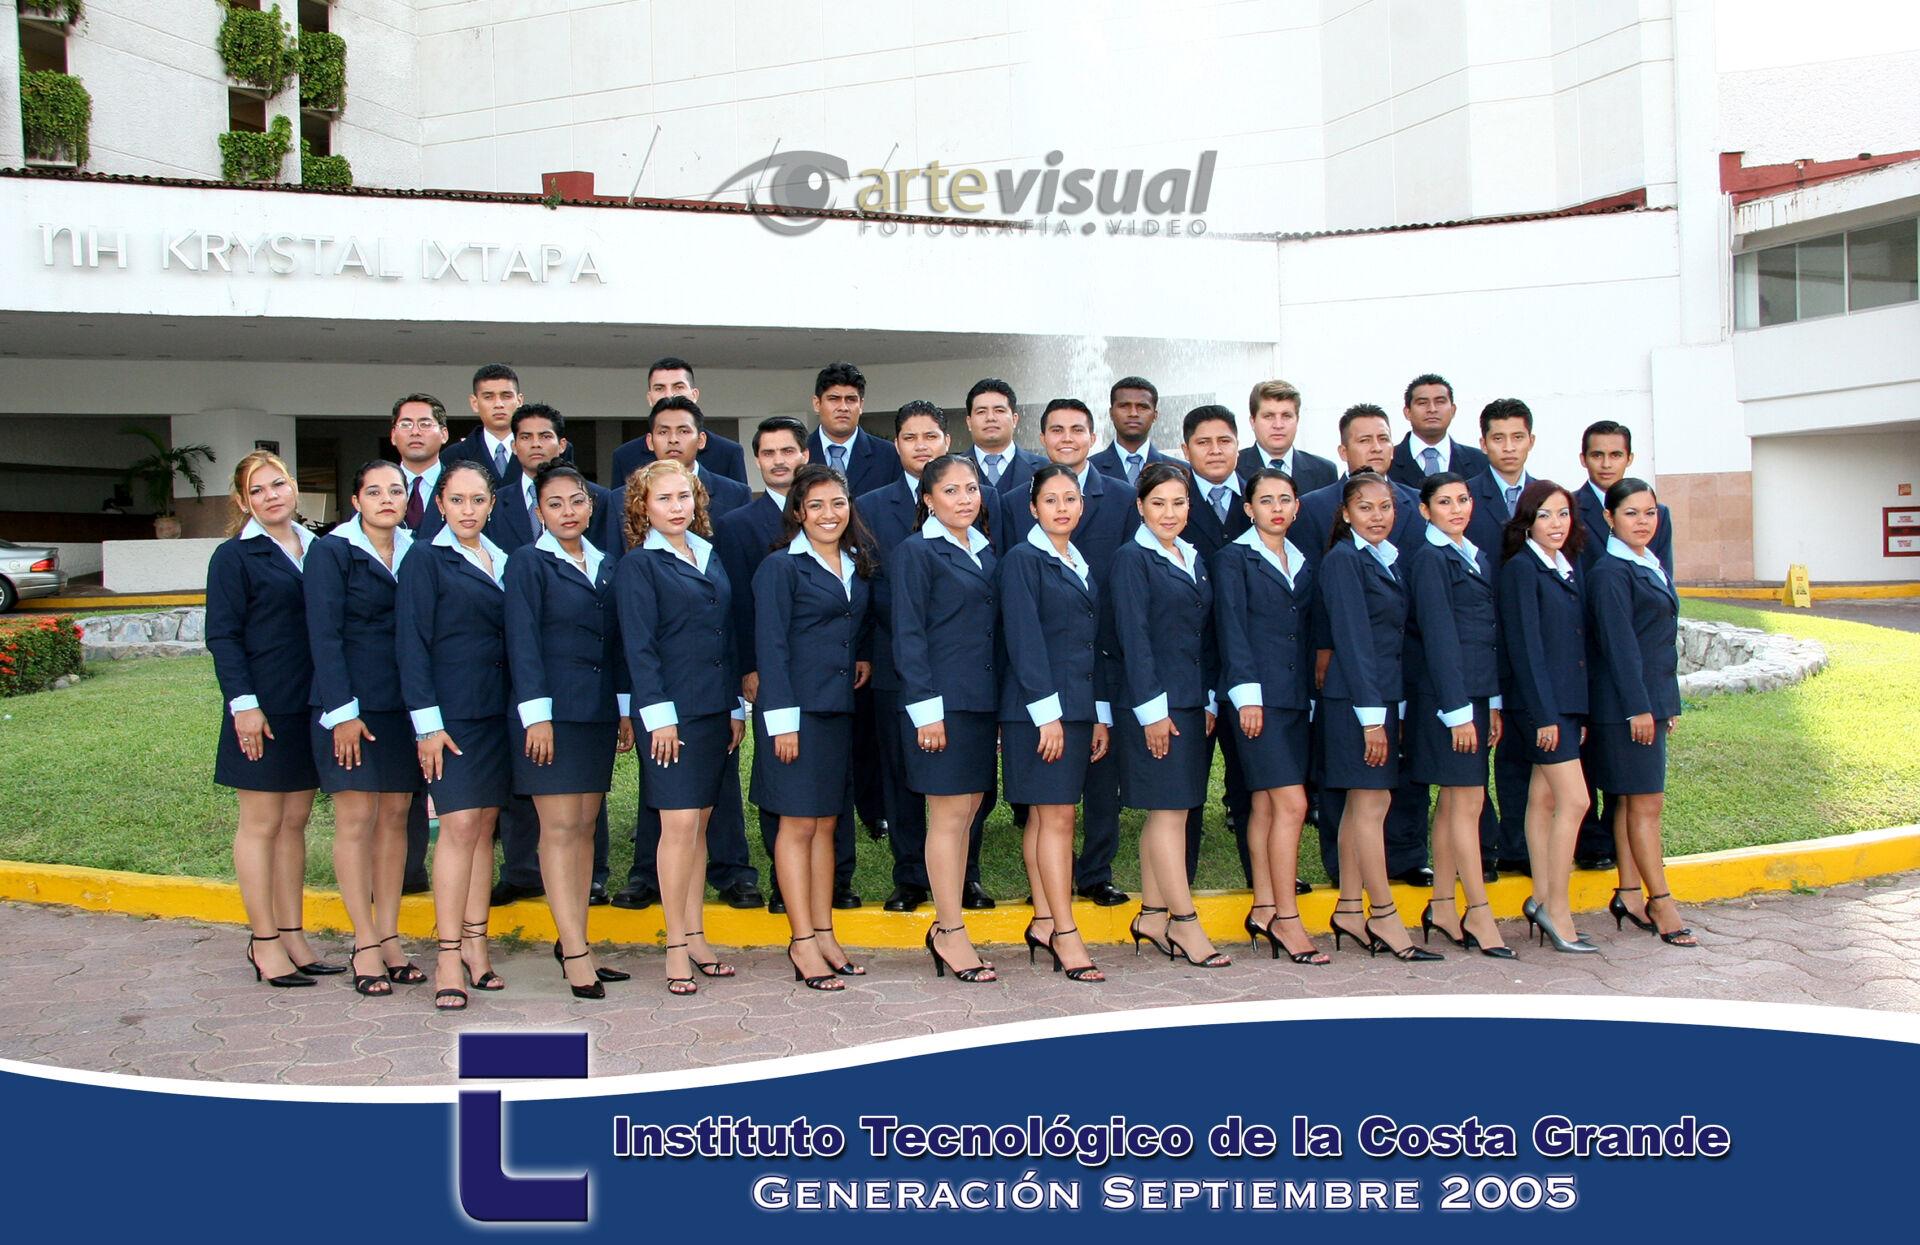 Grupo del Instituto Tecnológico de la Costa Grande